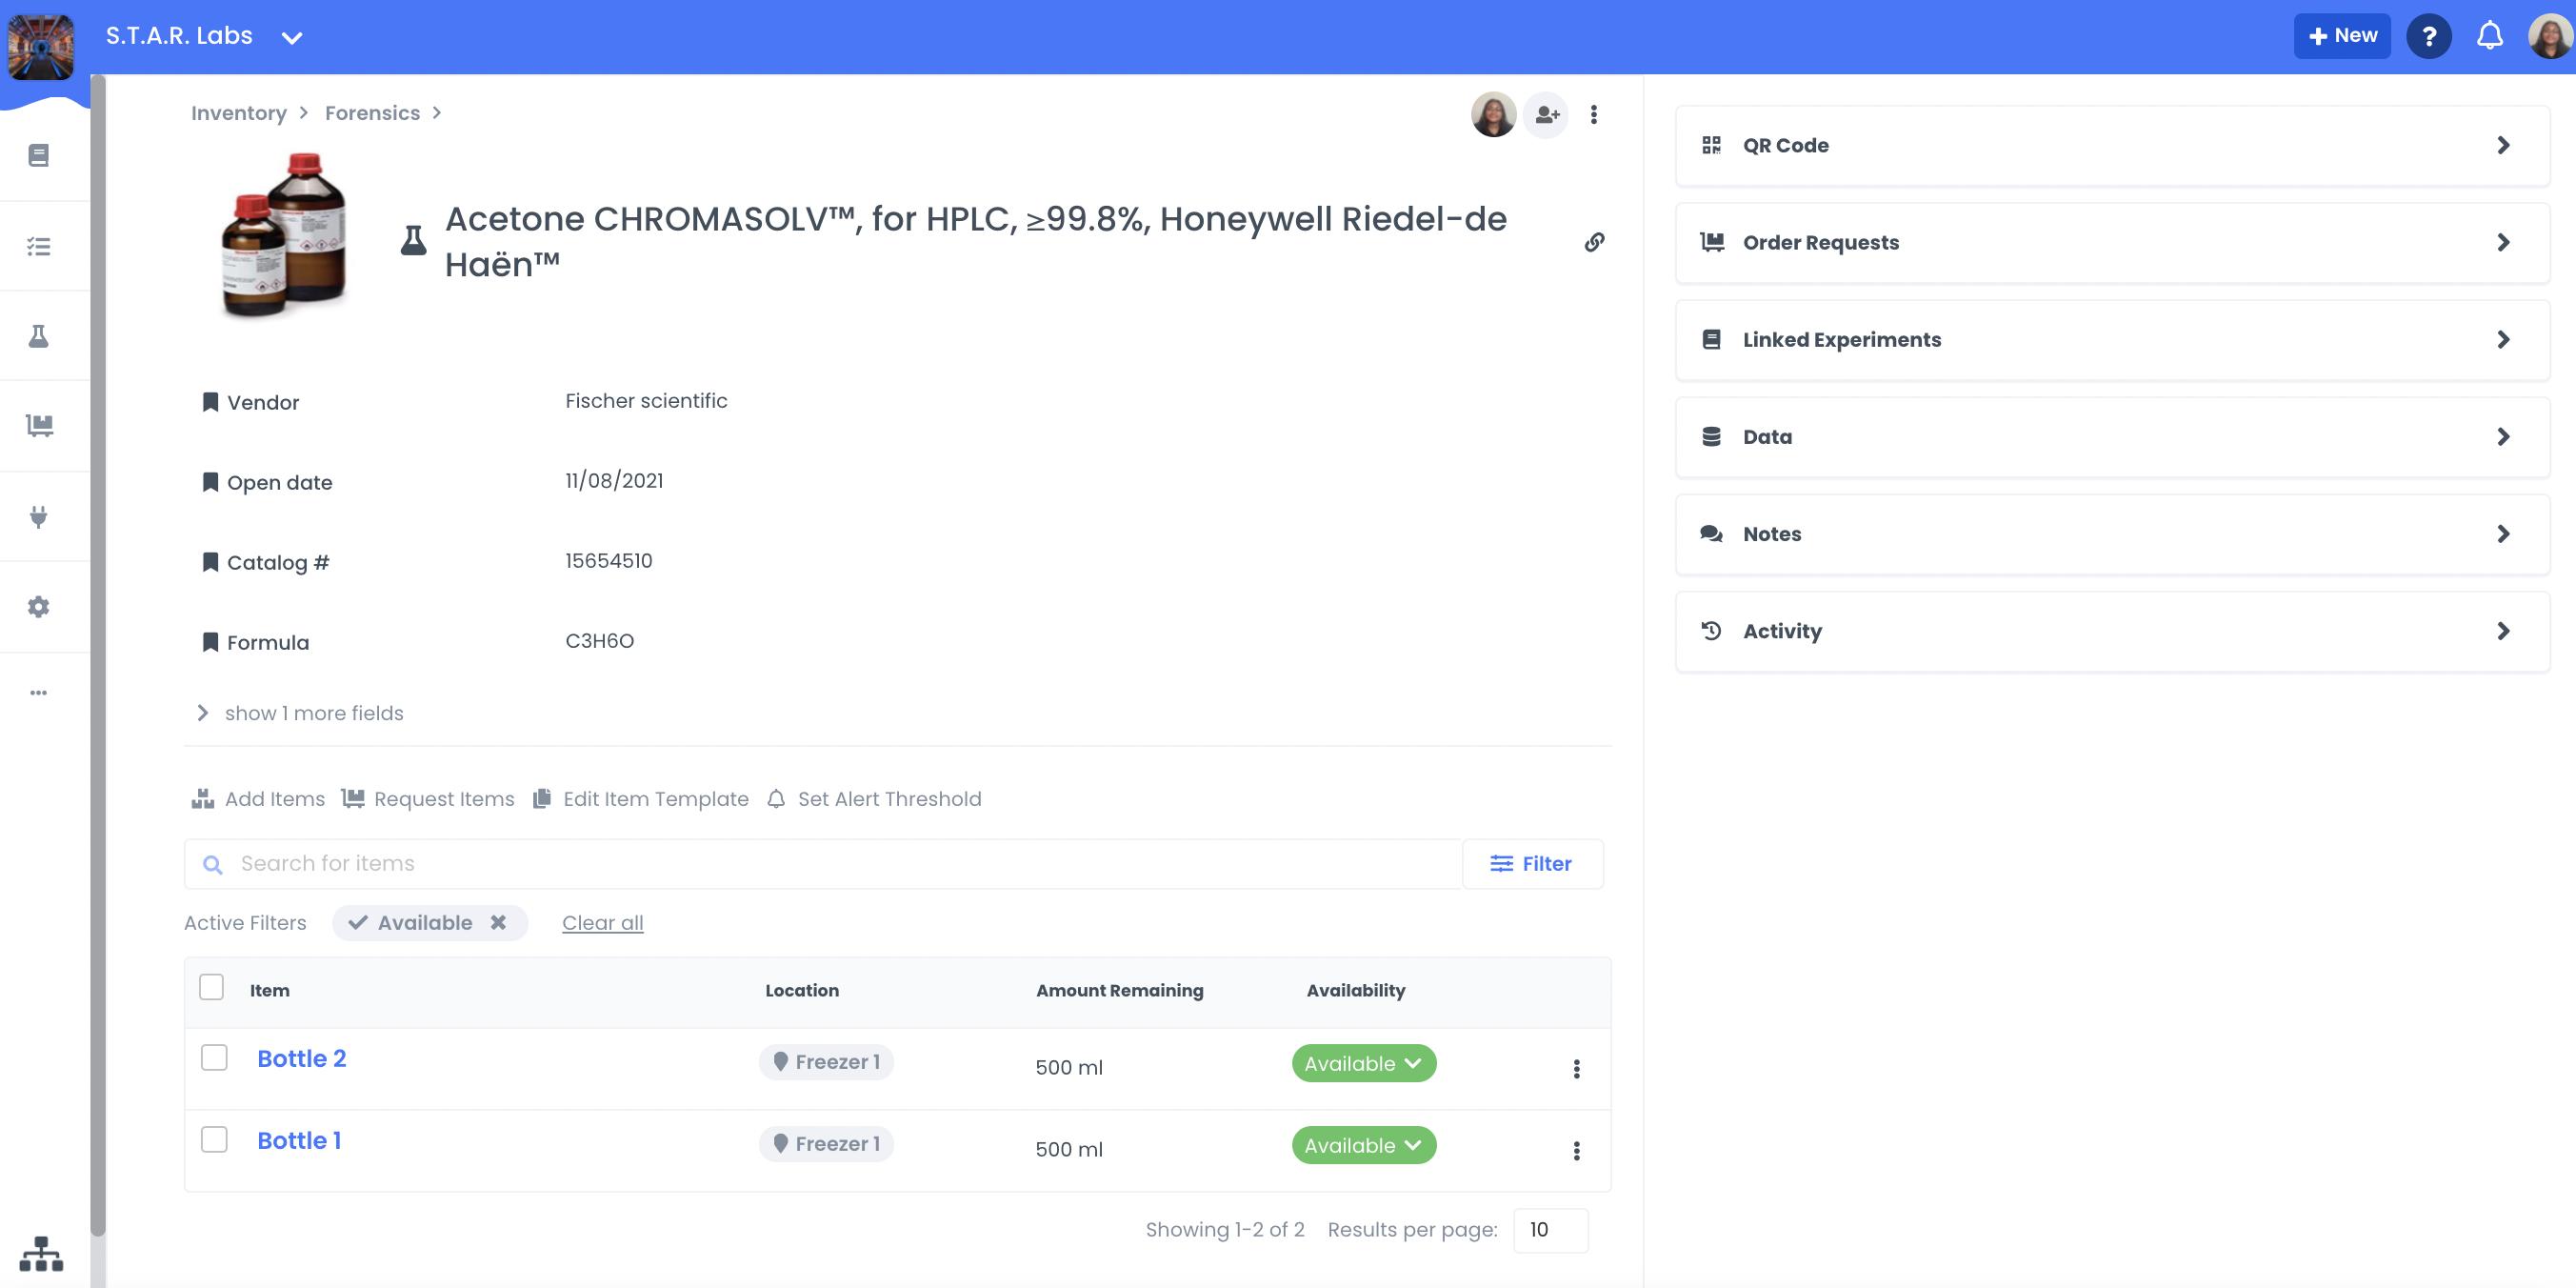 A screenshot showing what a resource looks like